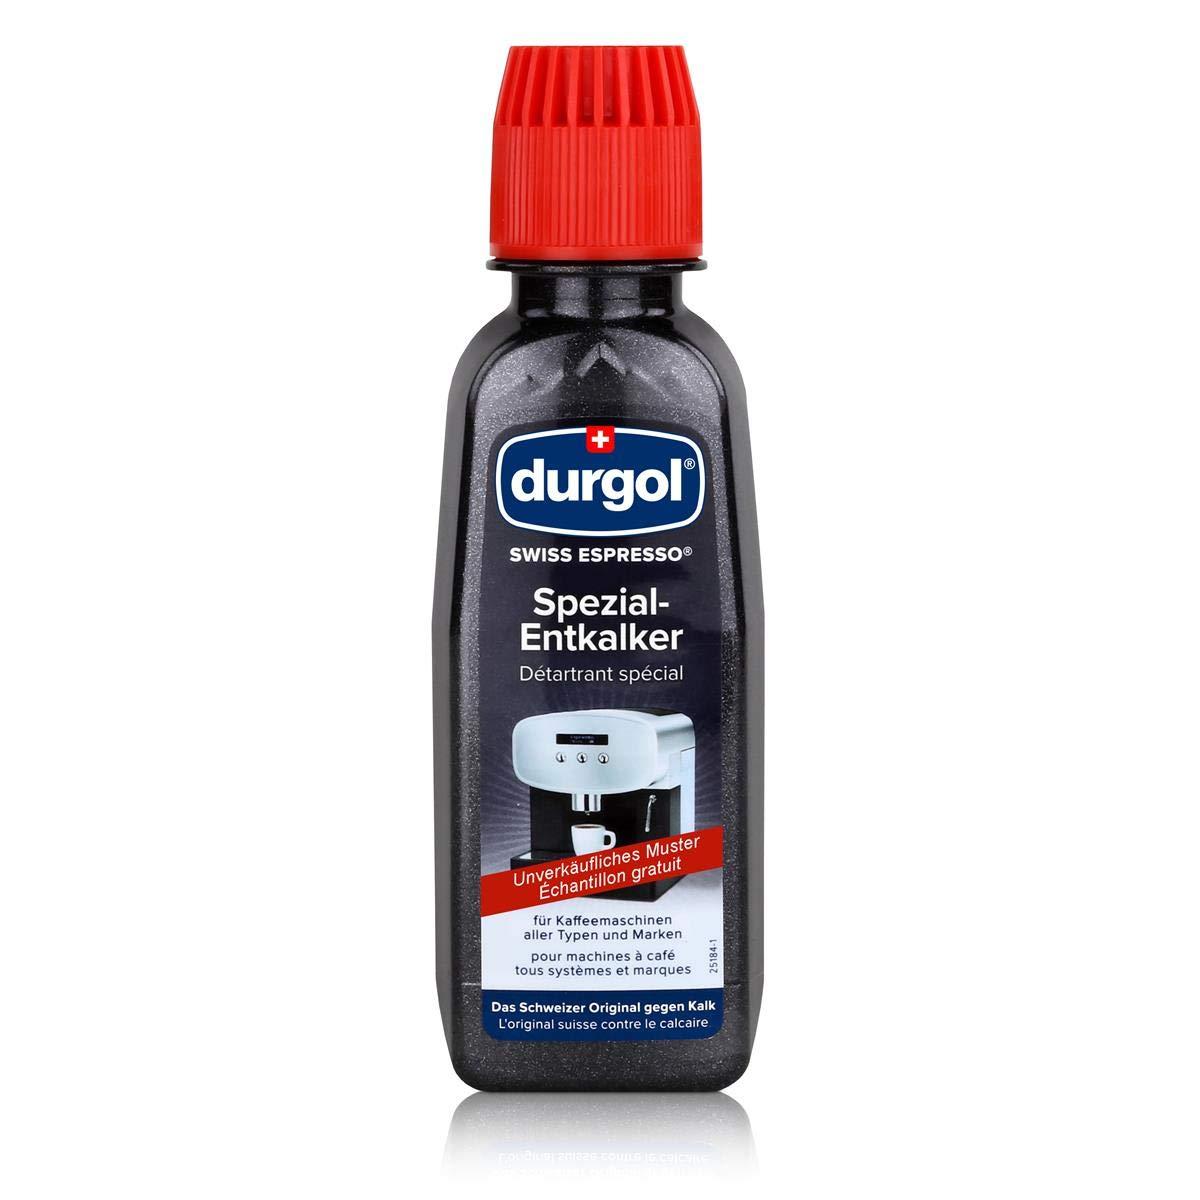 SCANPART Wasserfilter wie Philips Saeco AquaClean  CA6903+gratis Durgol Entkalk